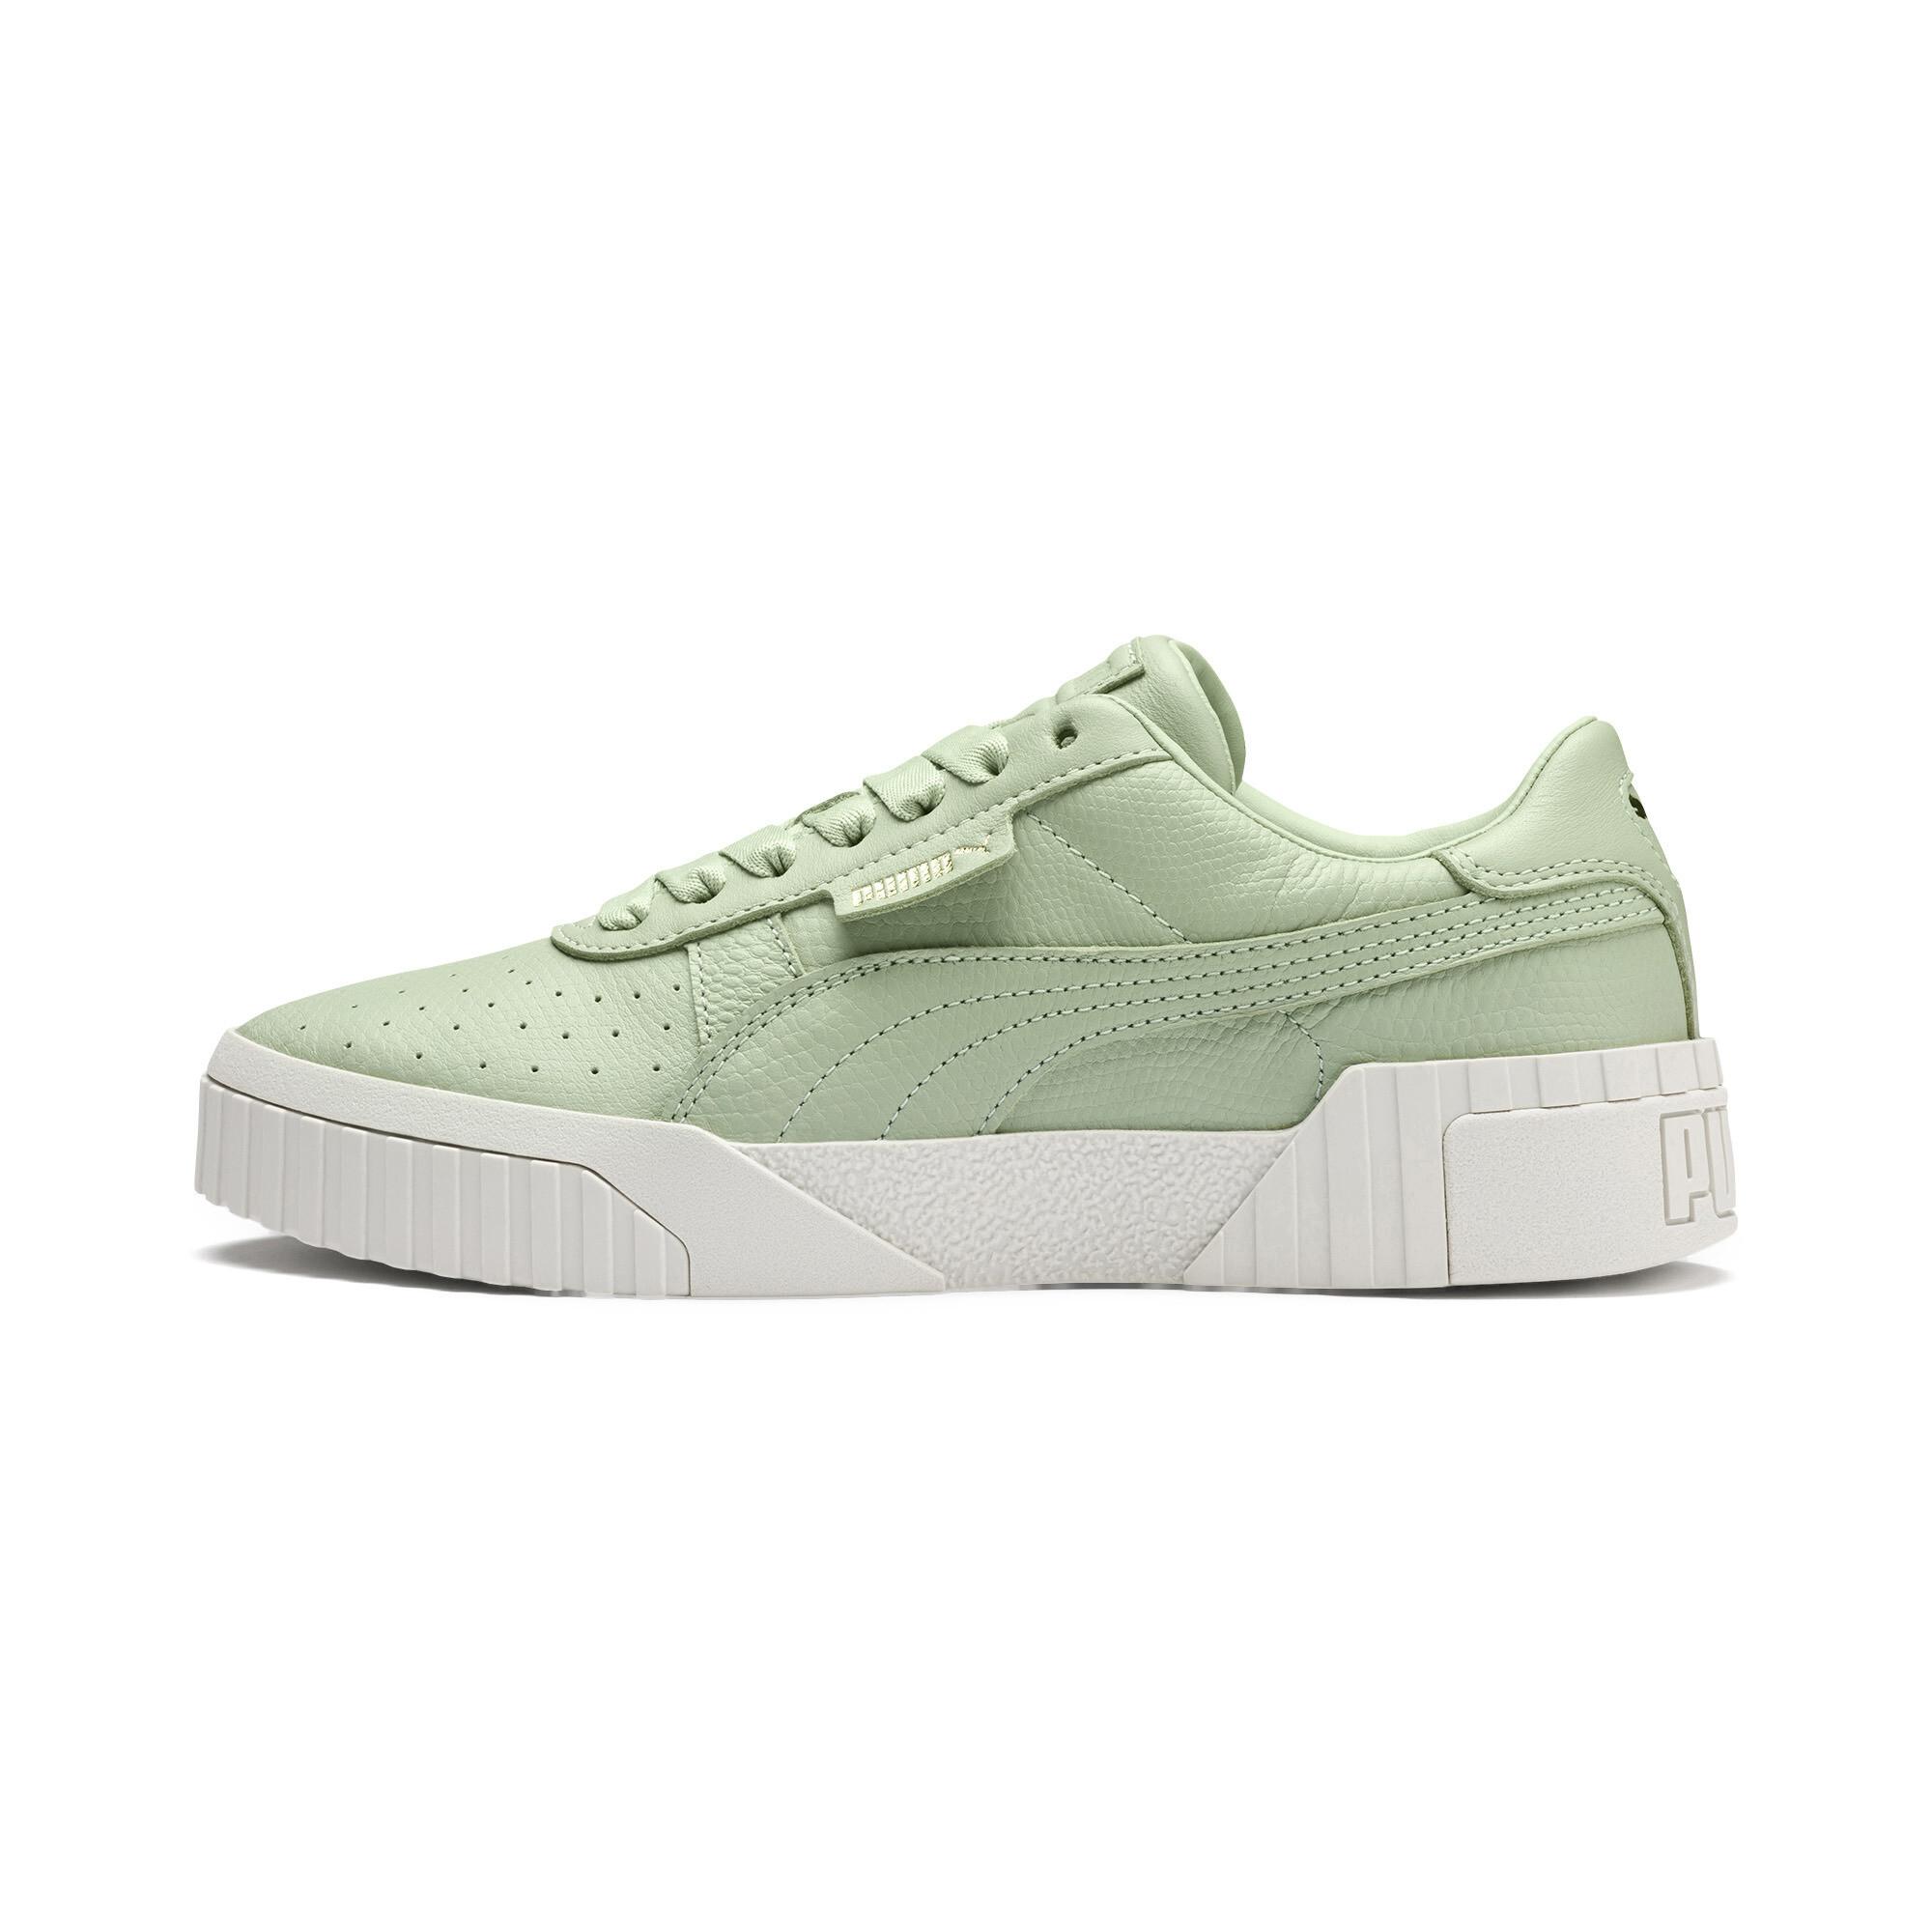 4b5a672c10 Women's Platform Sneakers | PUMA® Official Online Store